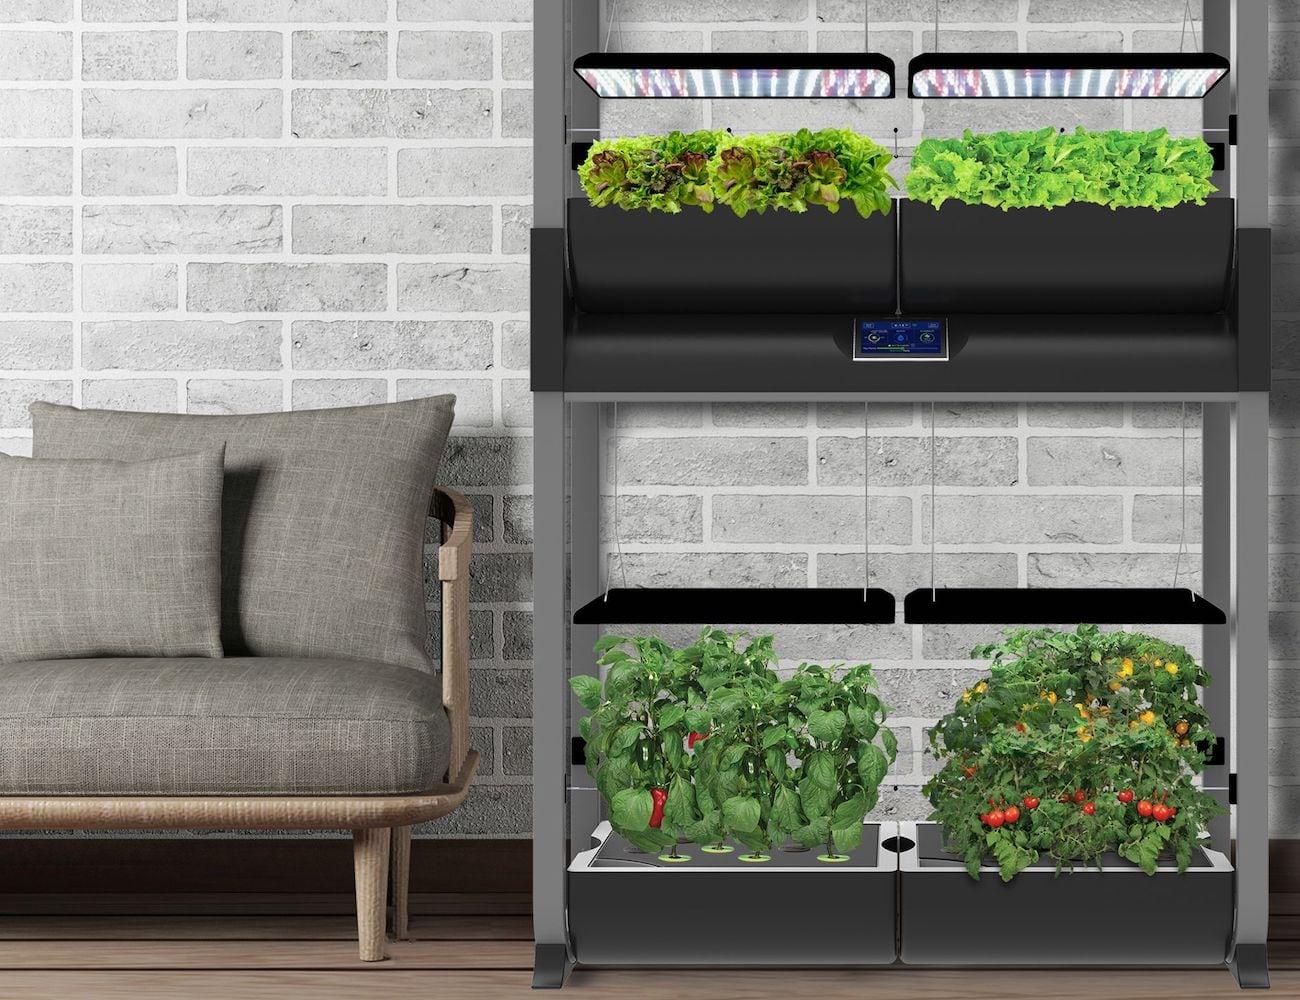 AeroGarden Farm Plus Smart Hydroponic Garden lets you grow all year long